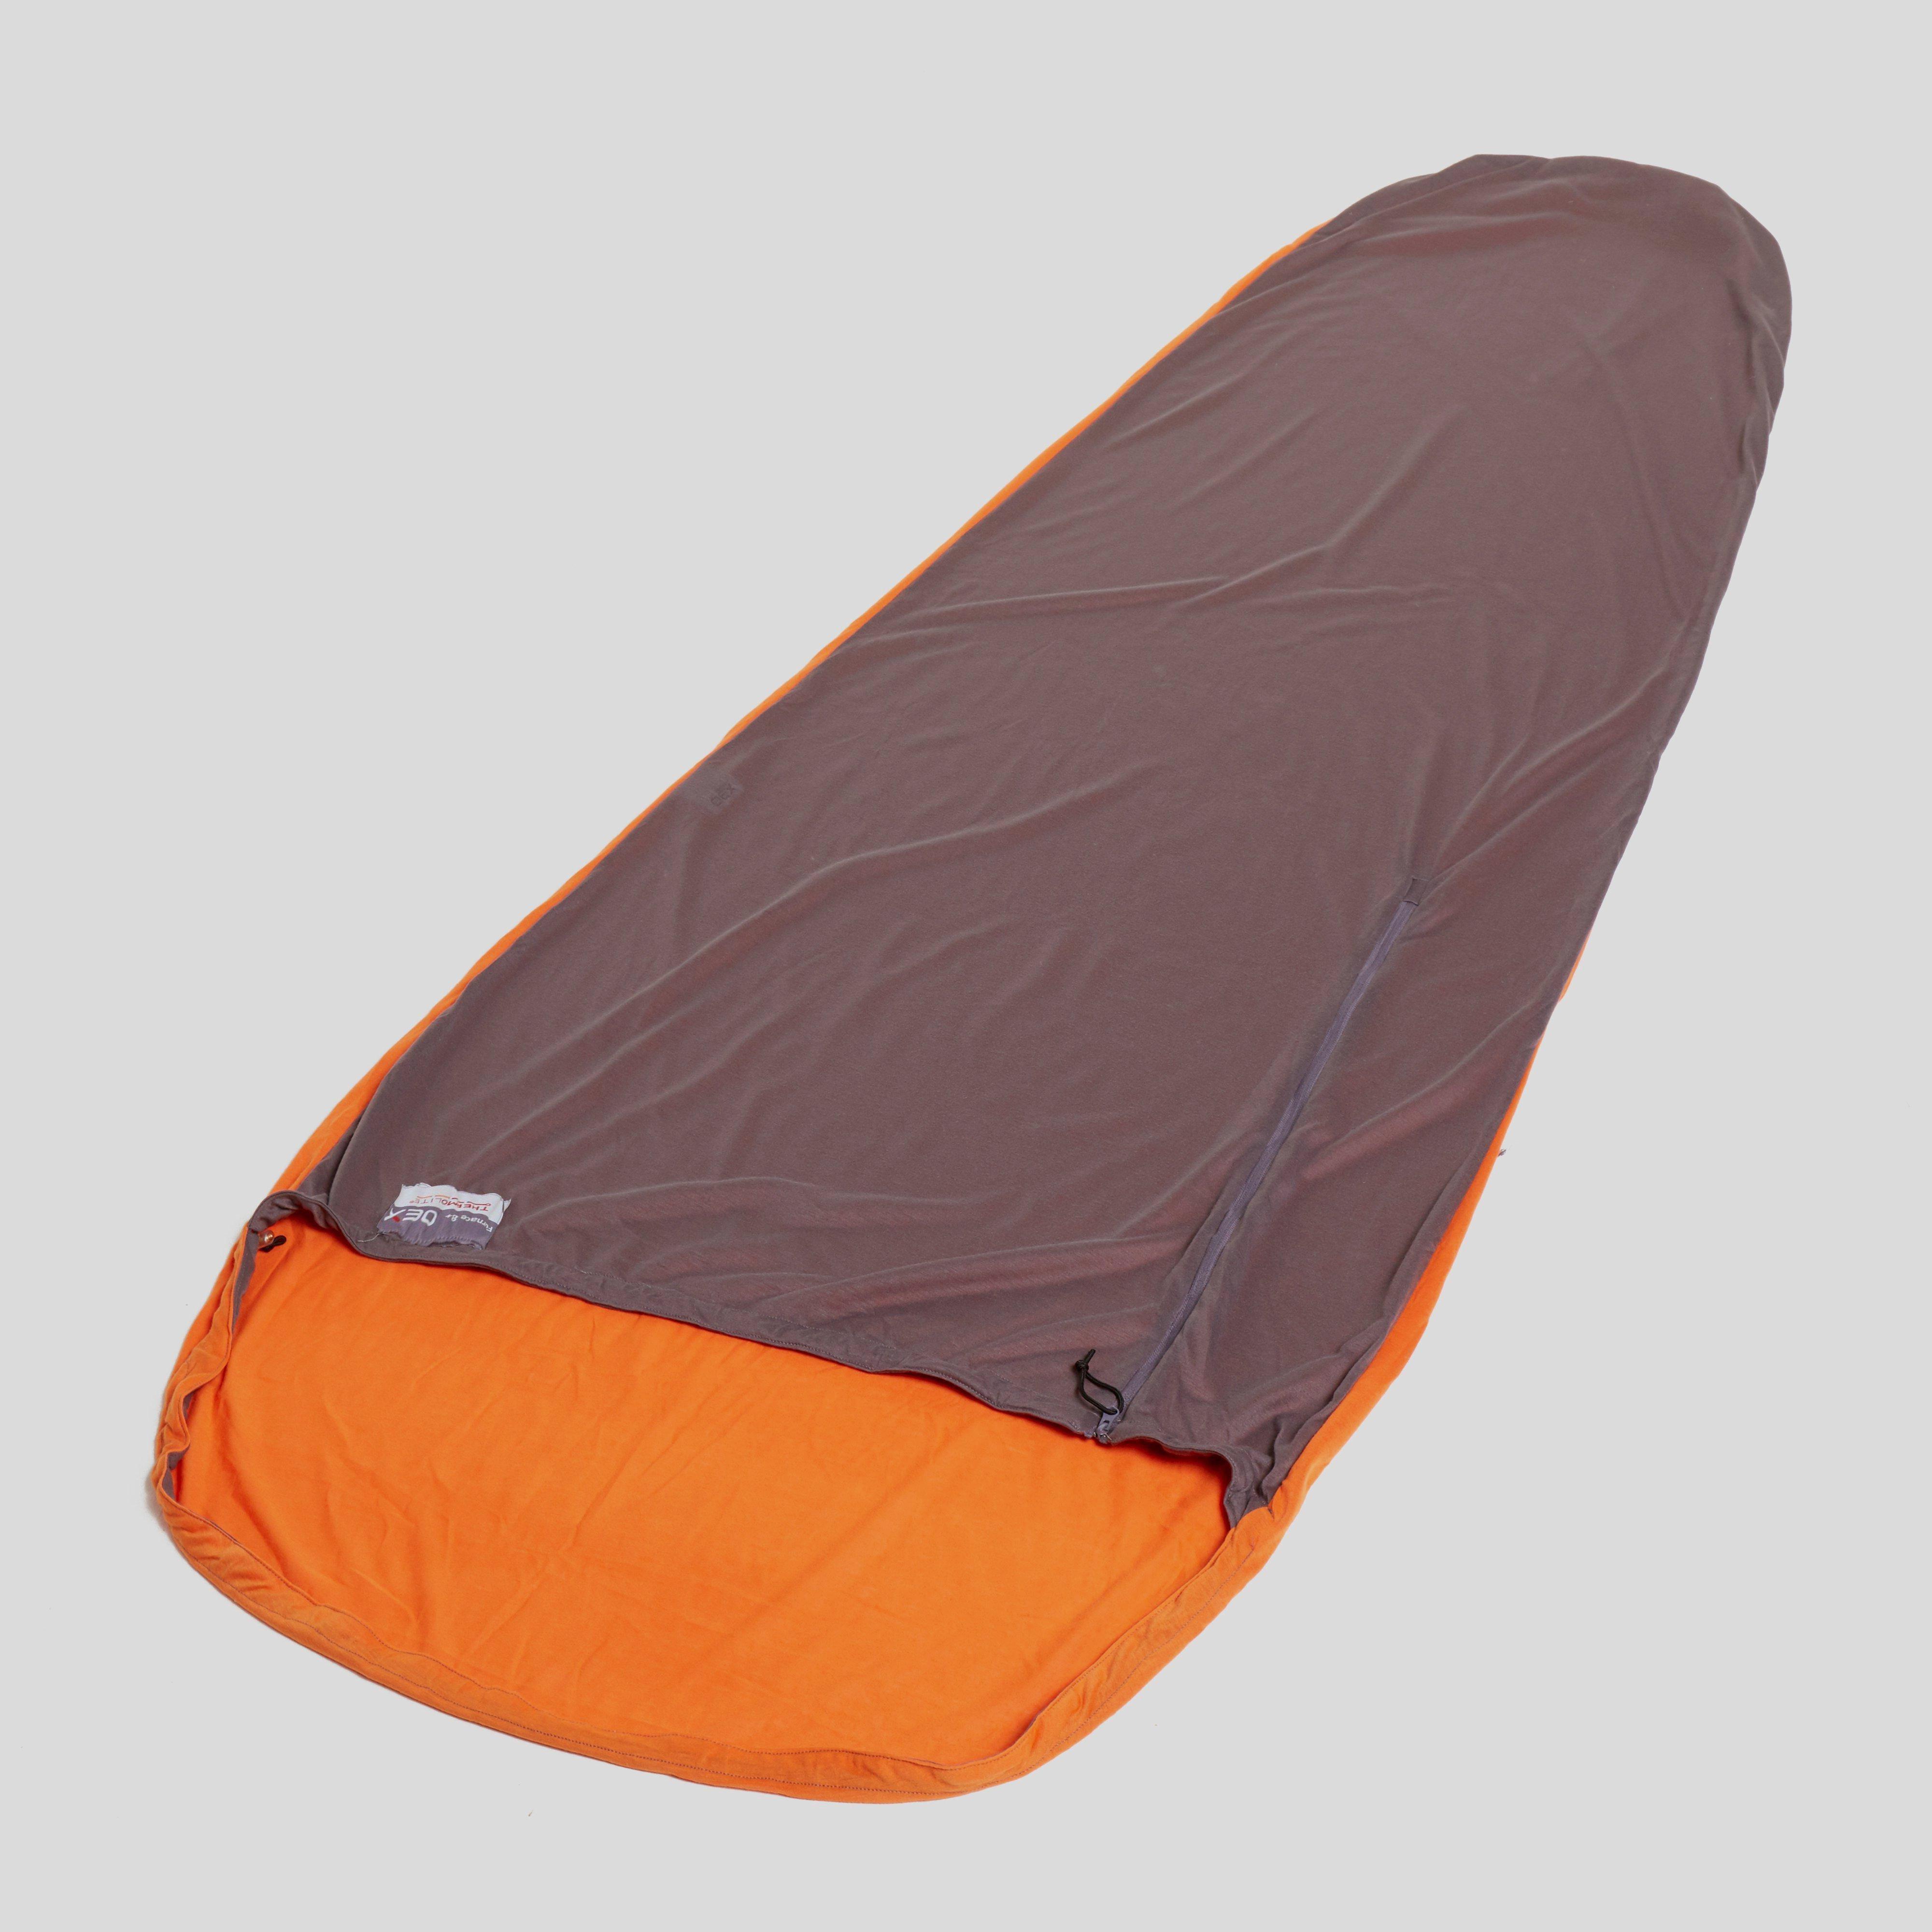 Oex Oex Furnace 8+ Liner, Orange